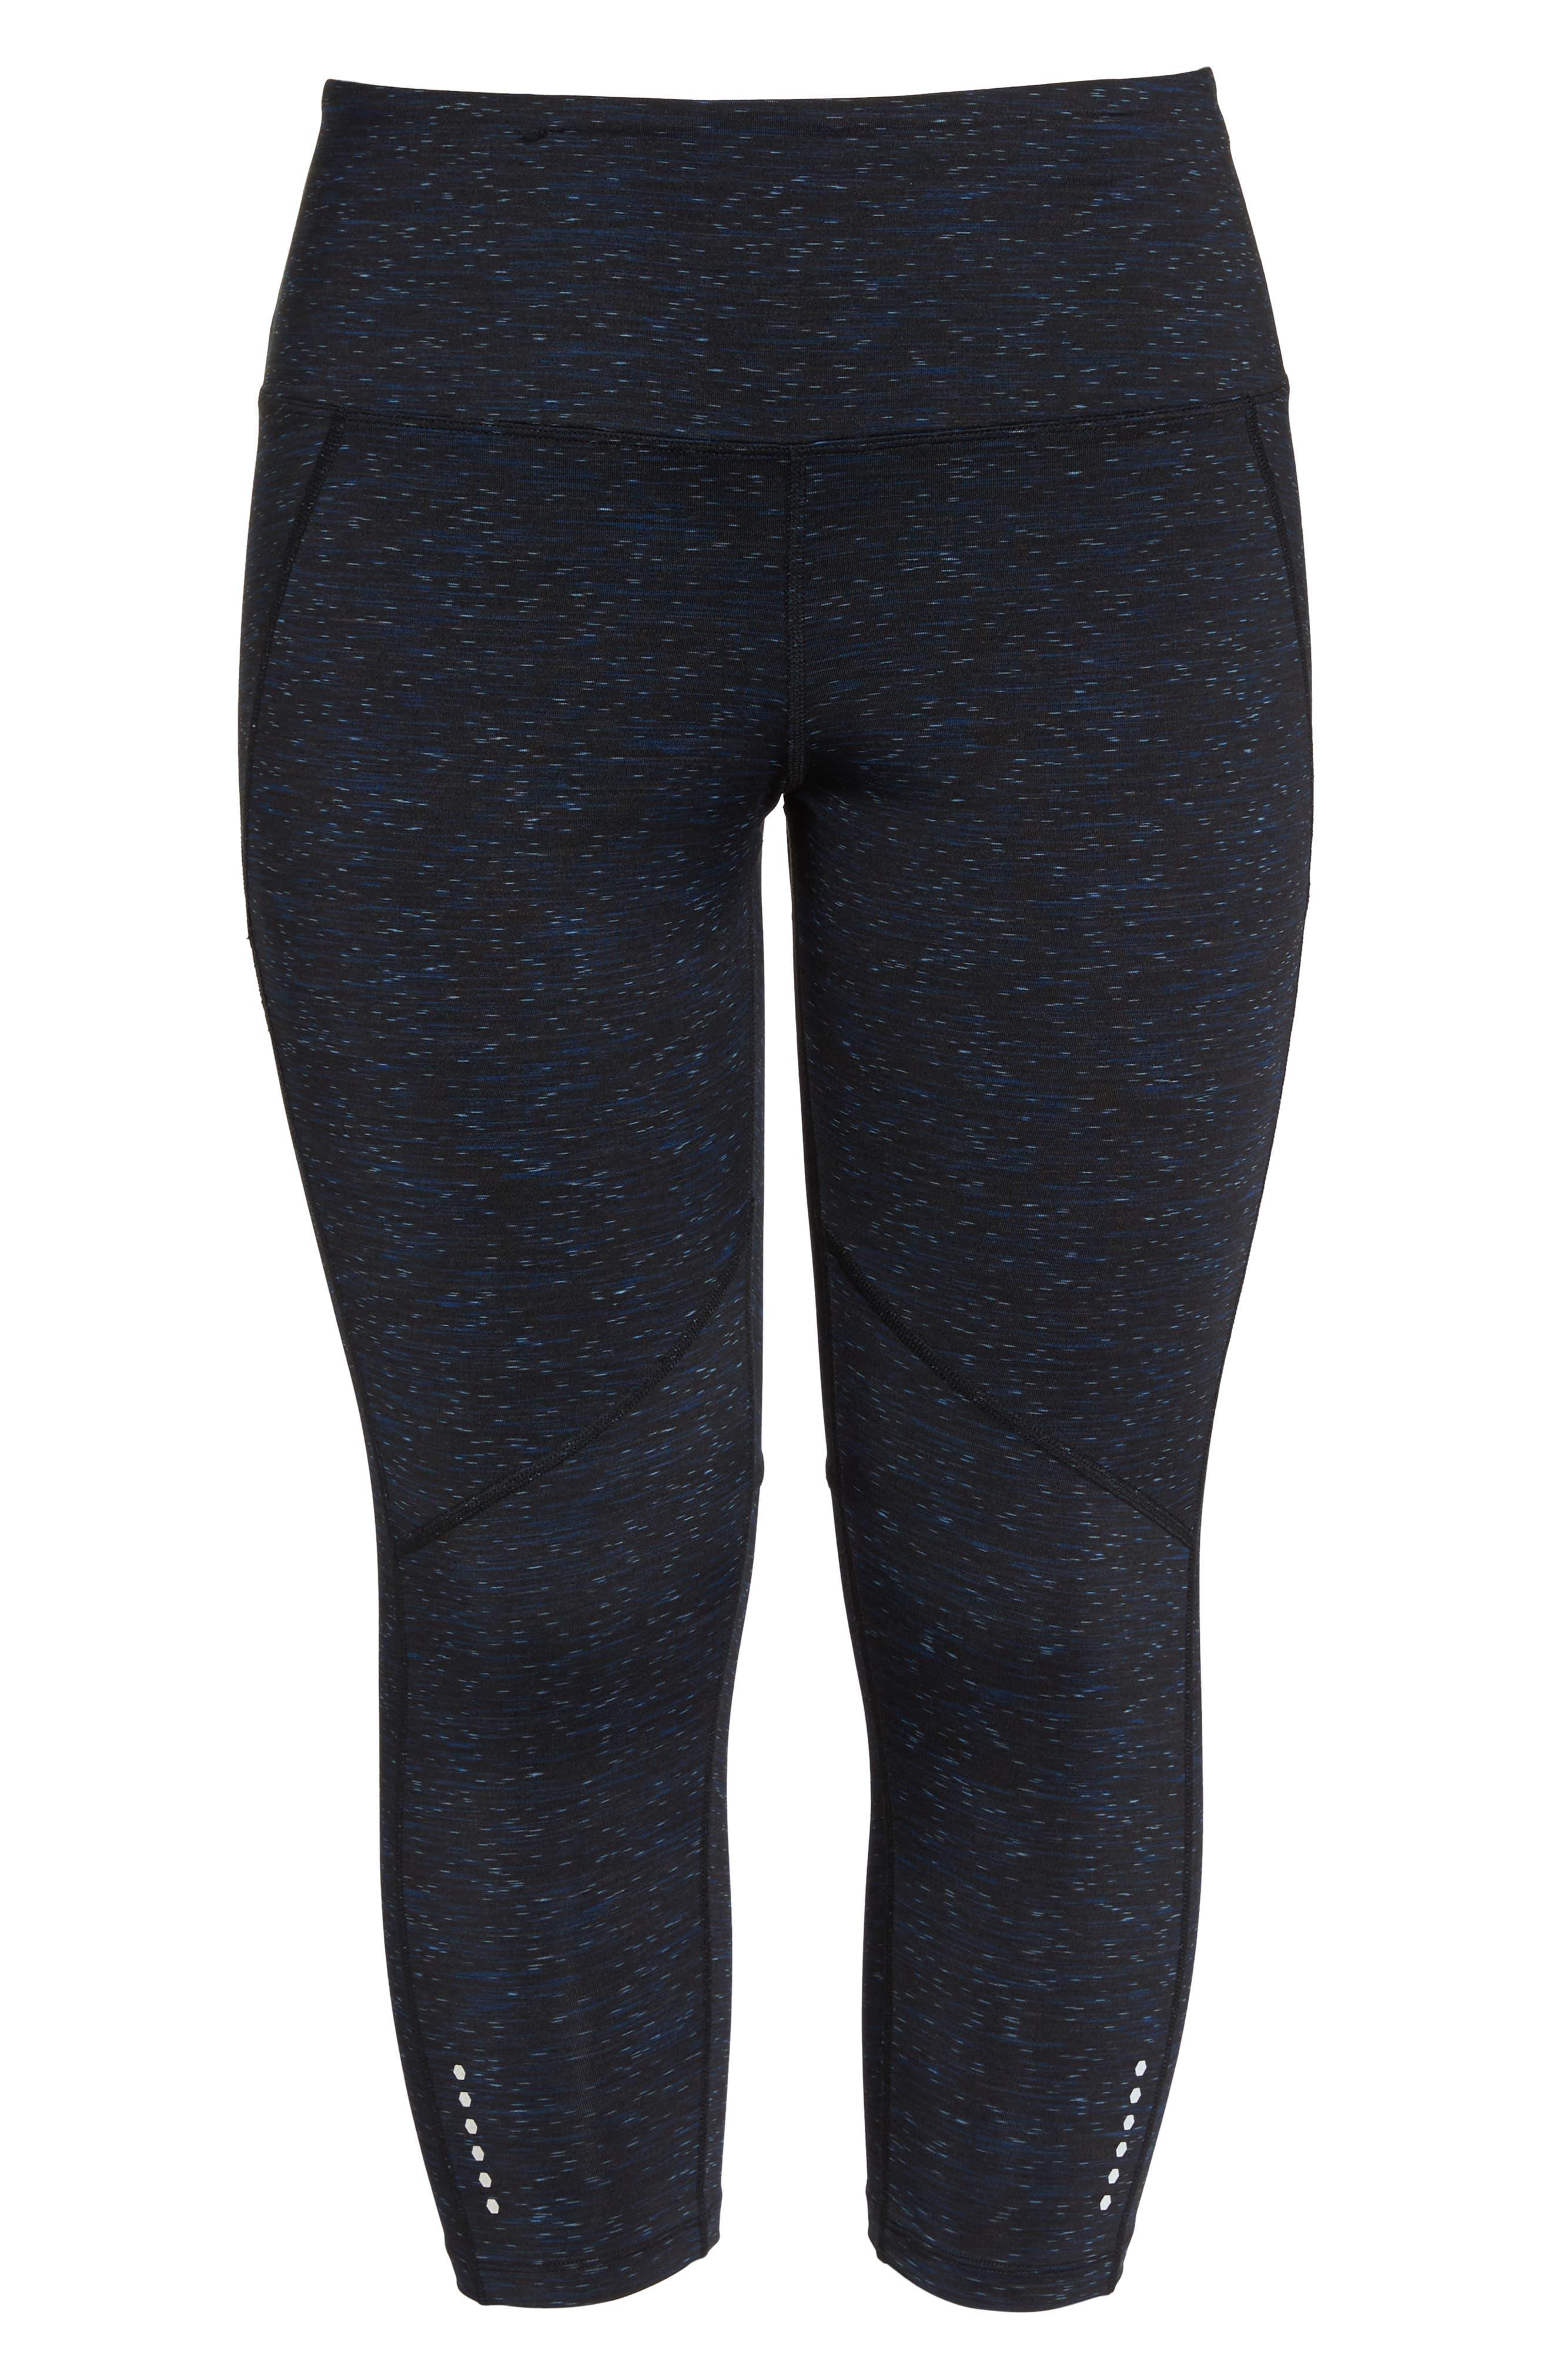 Kendall Energy Capri Leggings,                             Alternate thumbnail 7, color,                             BLACK/BLUE/SILVERLAKE SPACEDYE